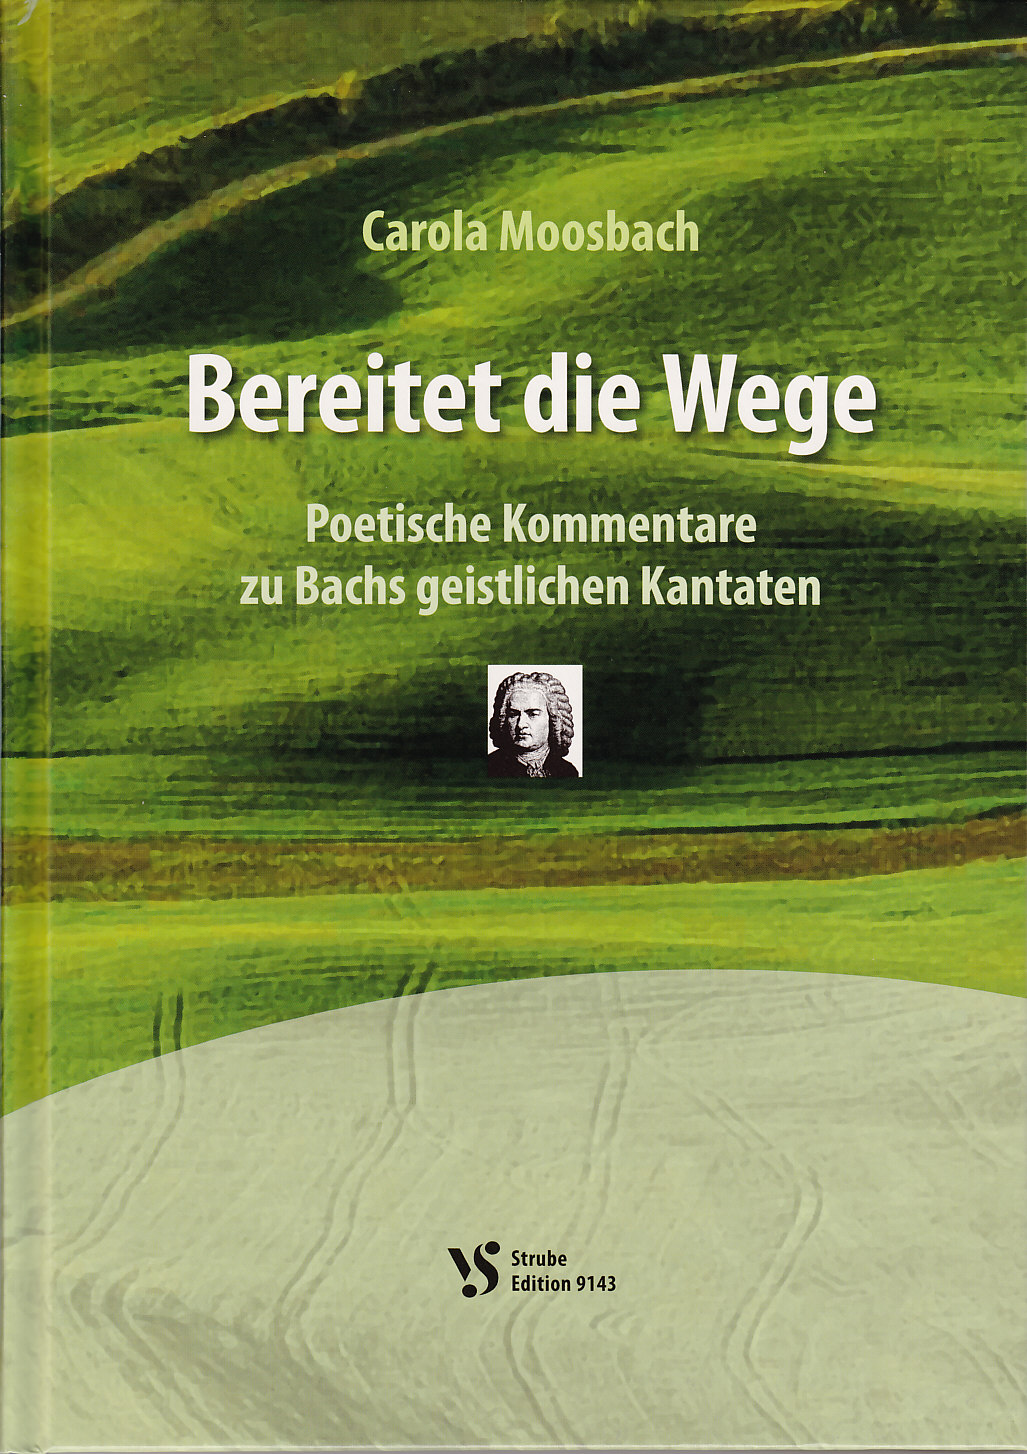 Bereitet die Wege Carola Moosbach